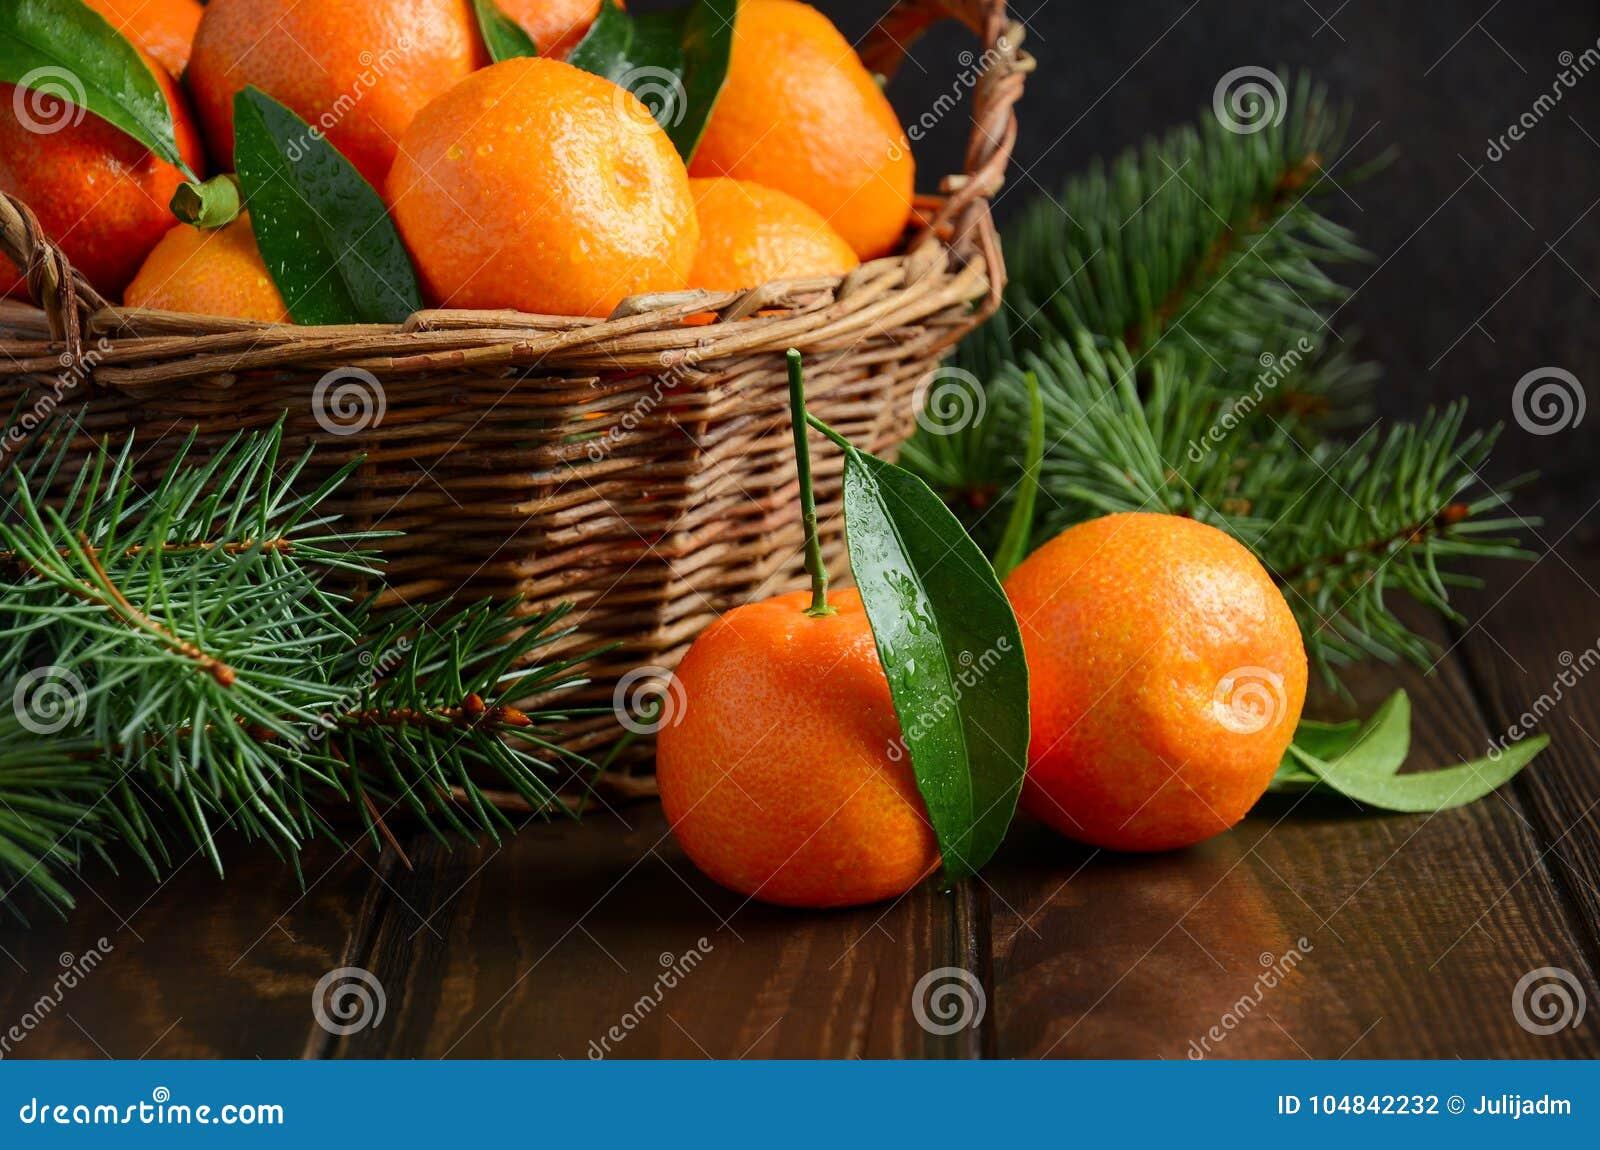 Clementine For Christmas.Fresh Tangerine Clementines On Dark Wooden Background